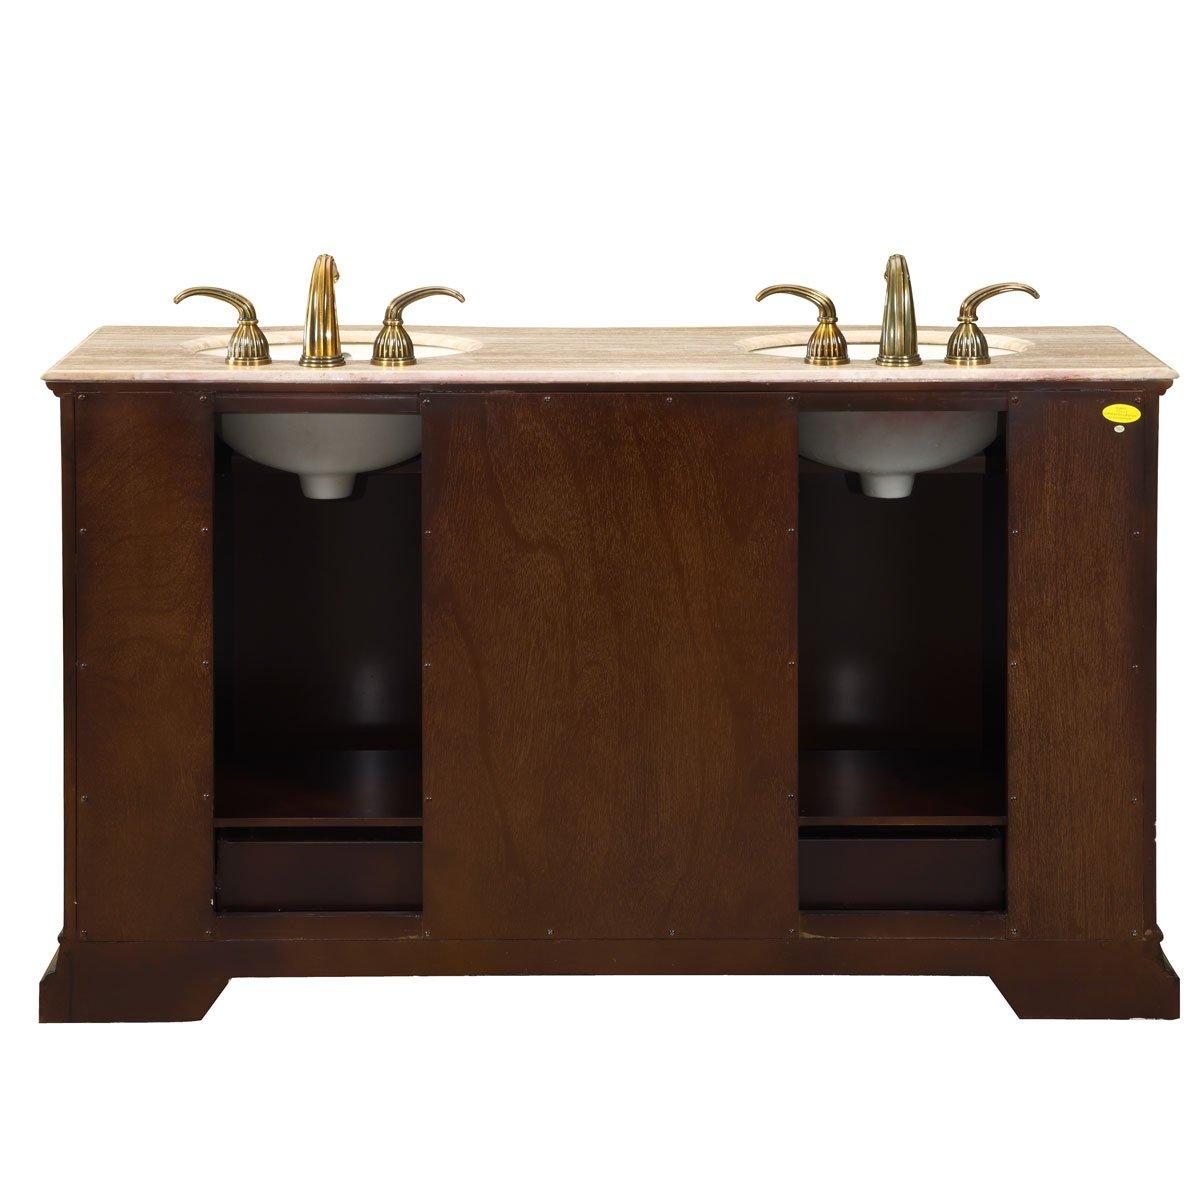 60 in bathroom vanity double sink. Amazon com  Silkroad Exclusive Bathroom Vanity HYP 0712 T UIC 60 Samantha Home Kitchen